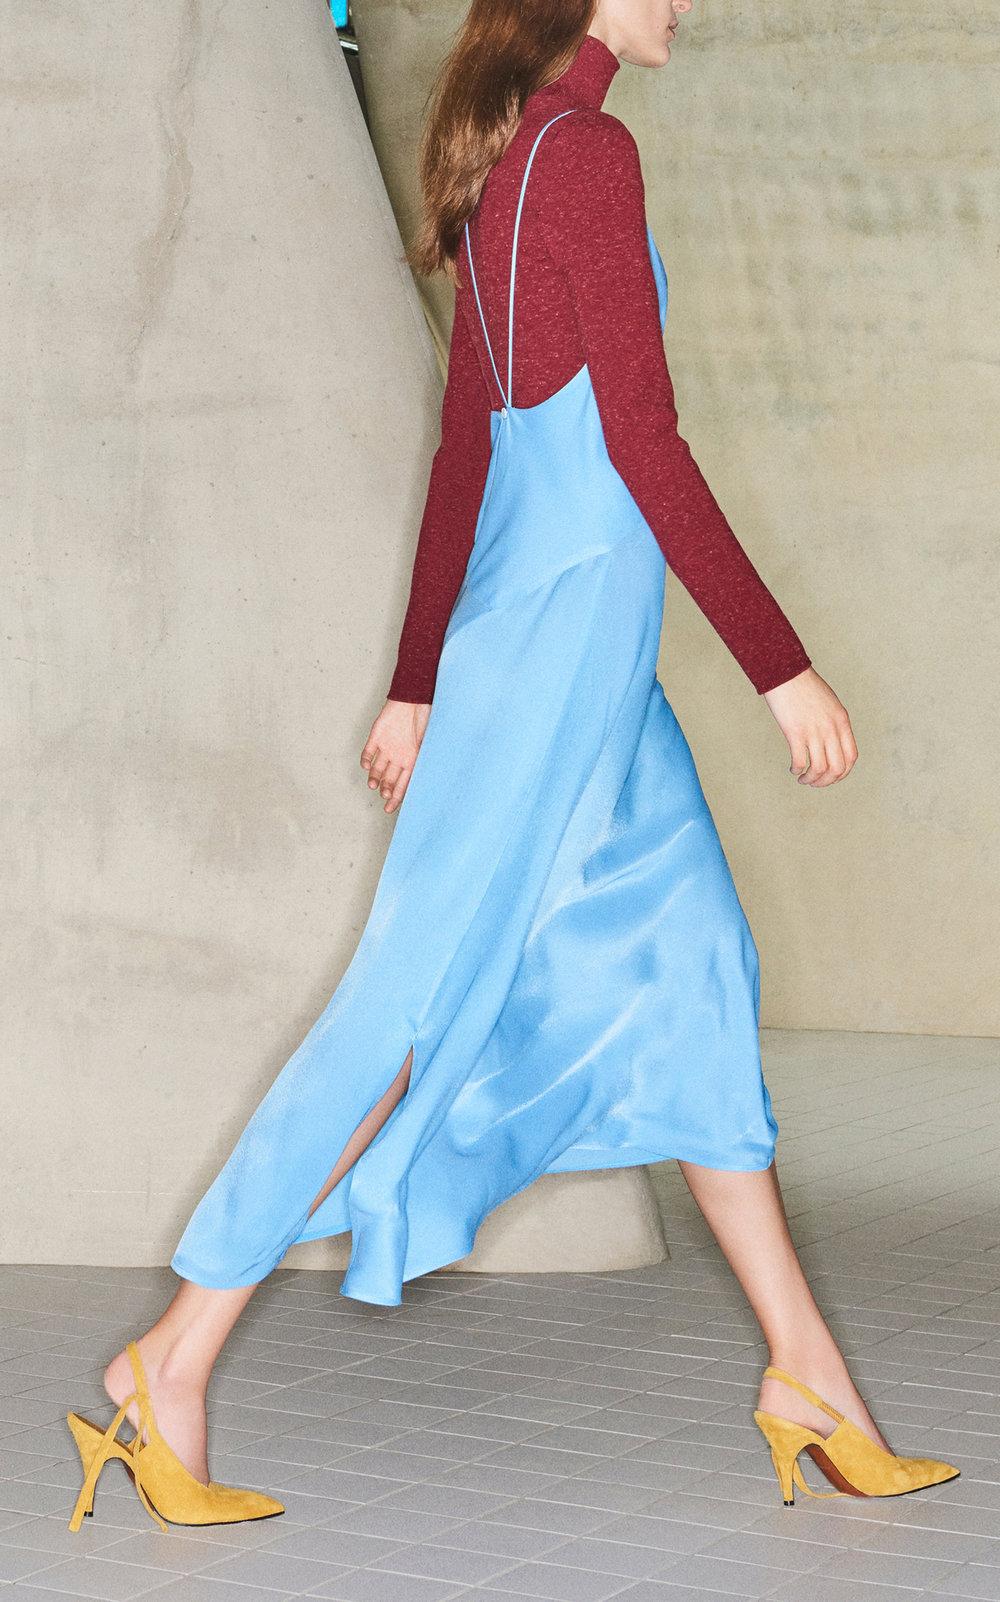 VICTORIA BECKHAM  // V-NECK DRAPE DRESS